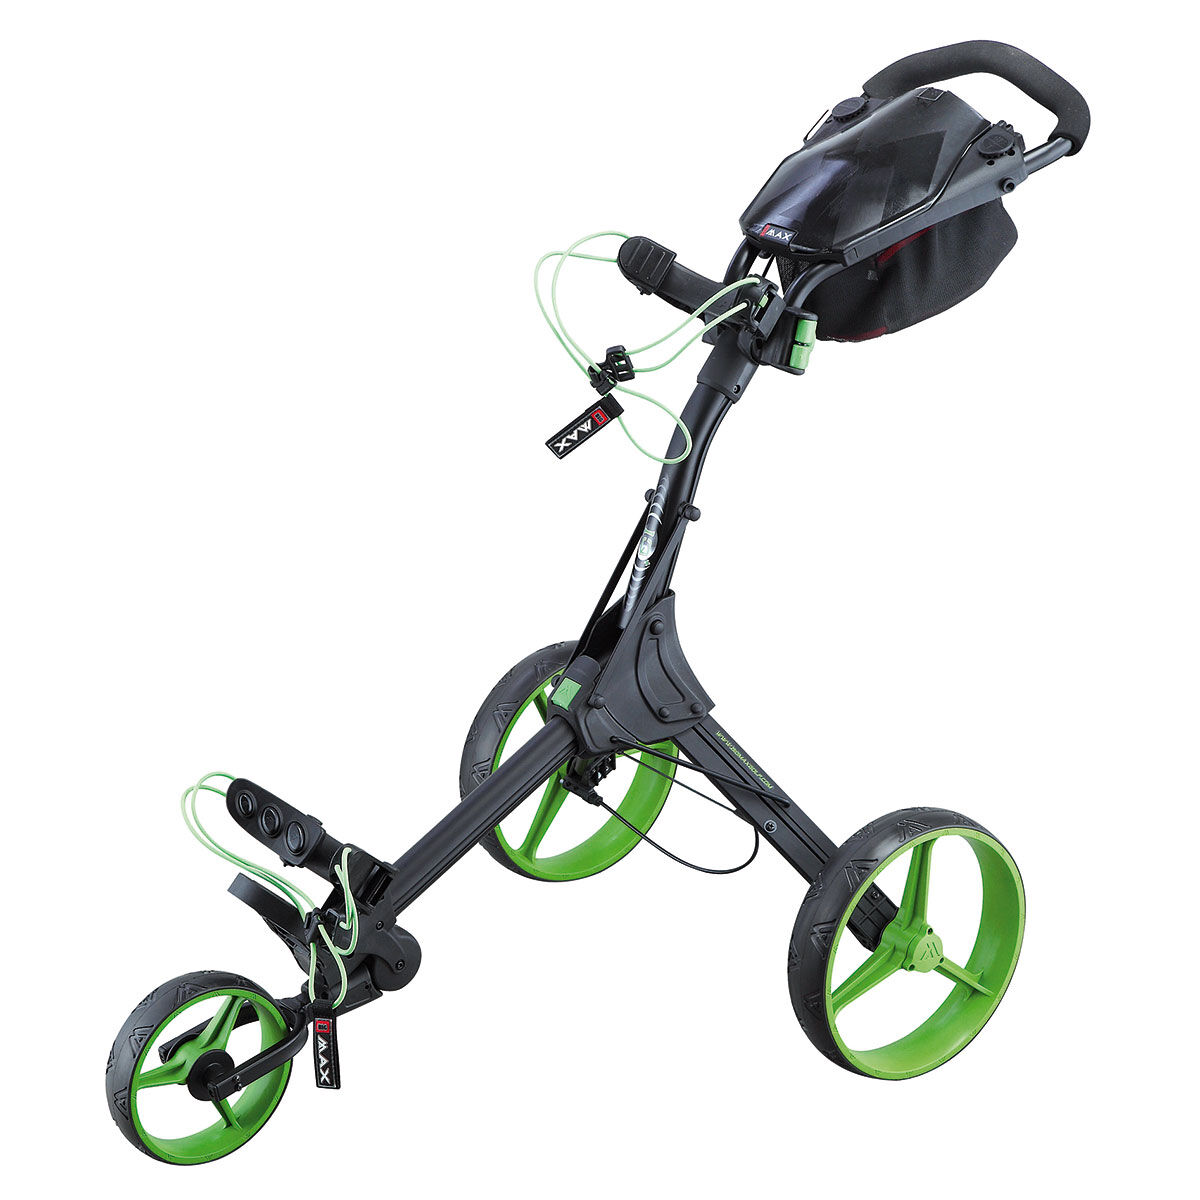 Chariot BIG MAX IQ Plus, homme, Noir/Vert citron    Online Golf